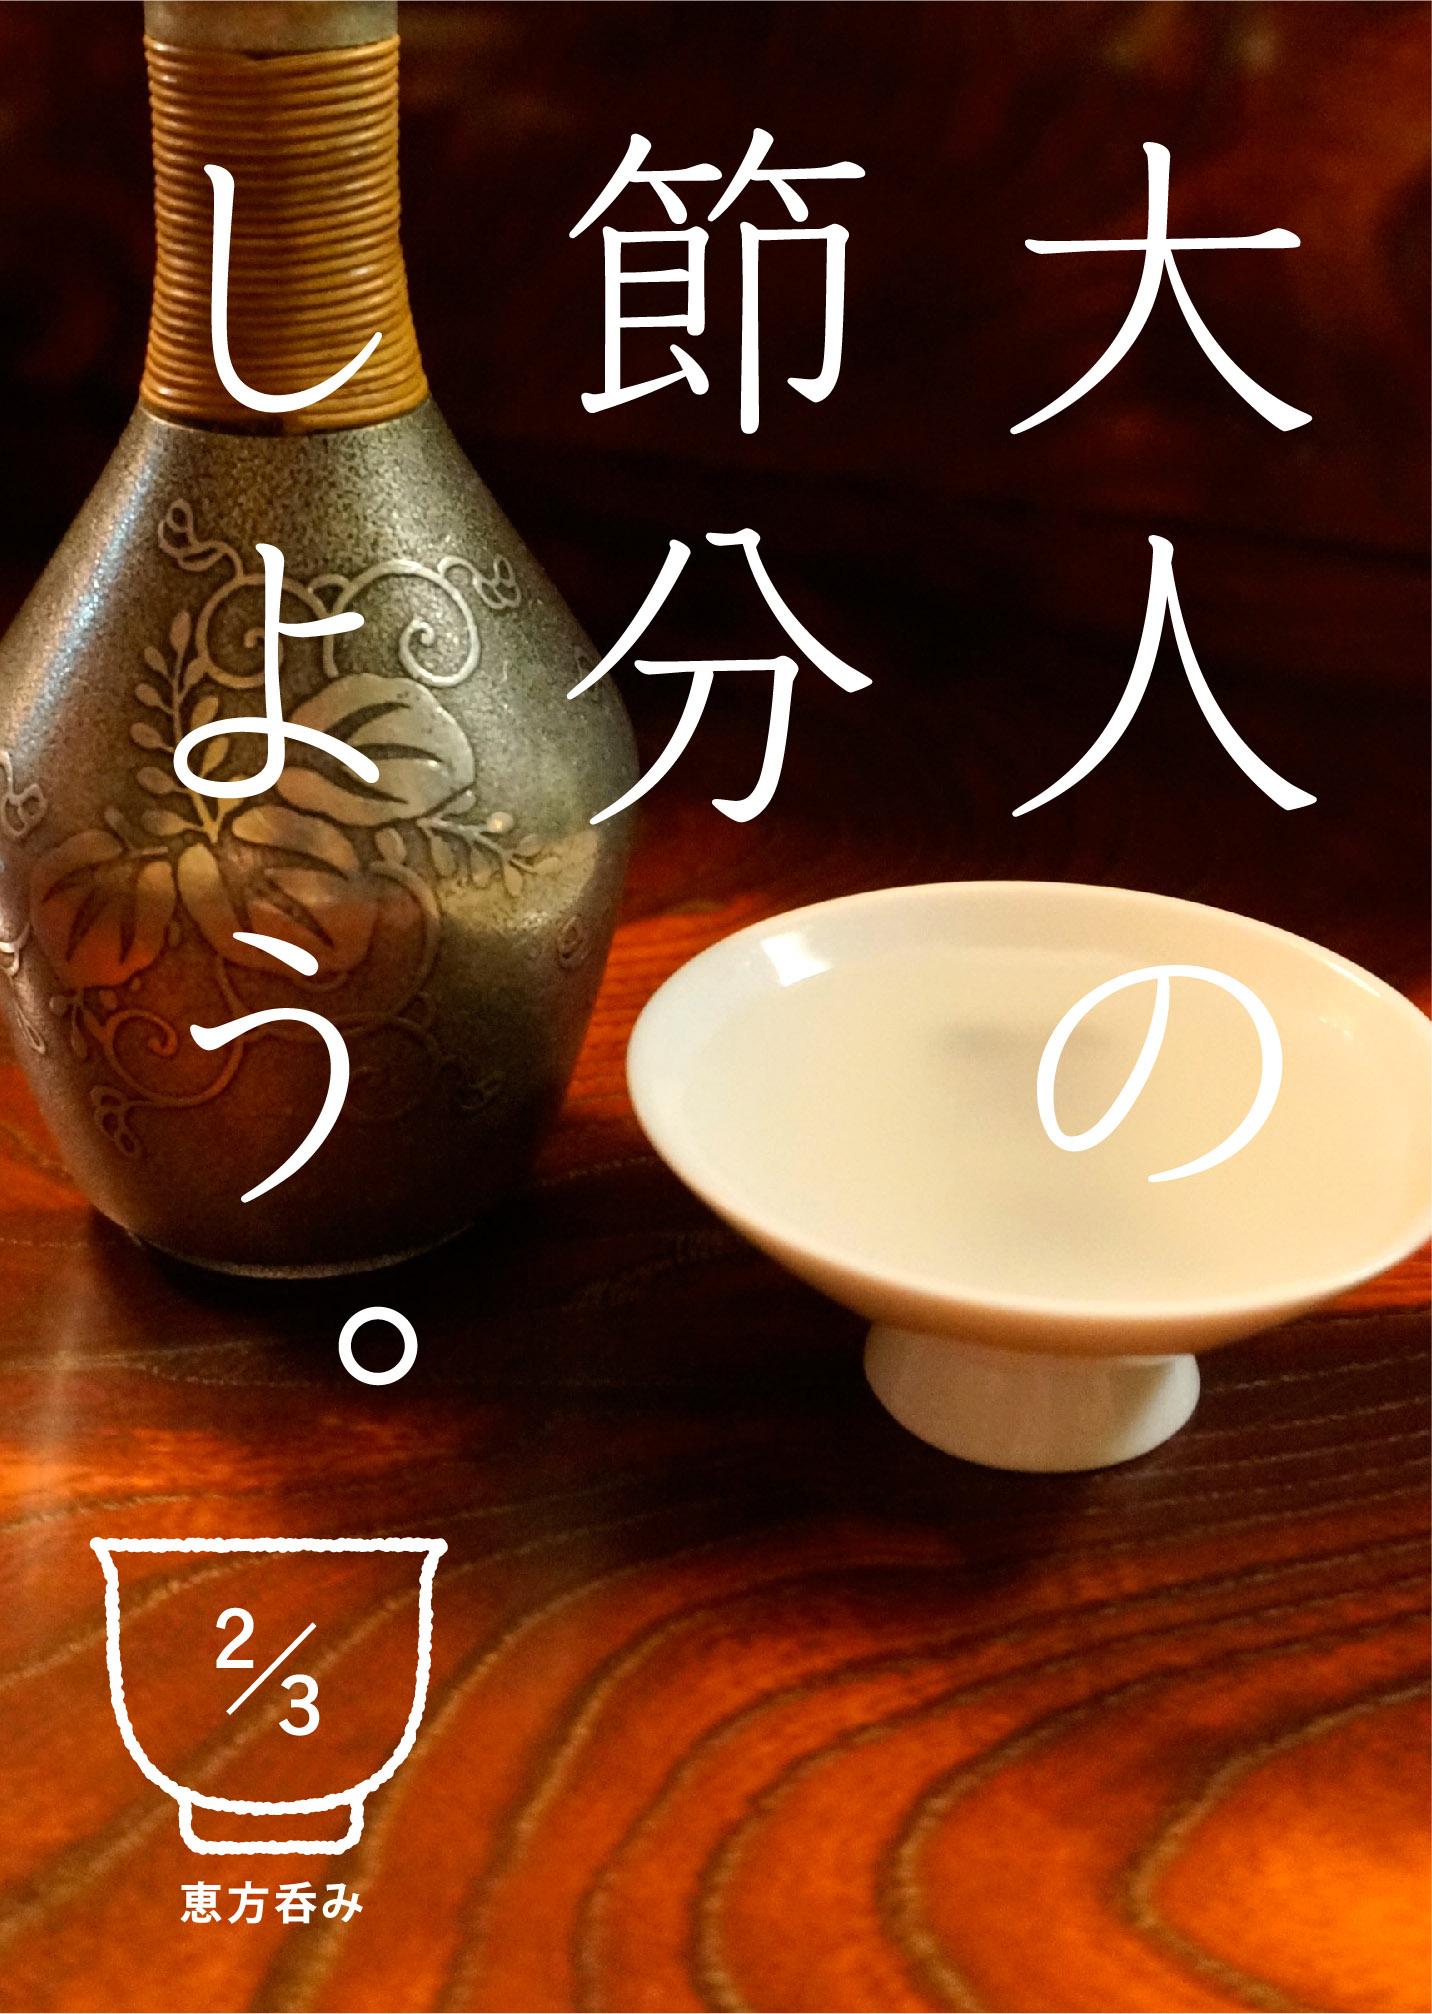 ehonomi2015_0203_2_jpg